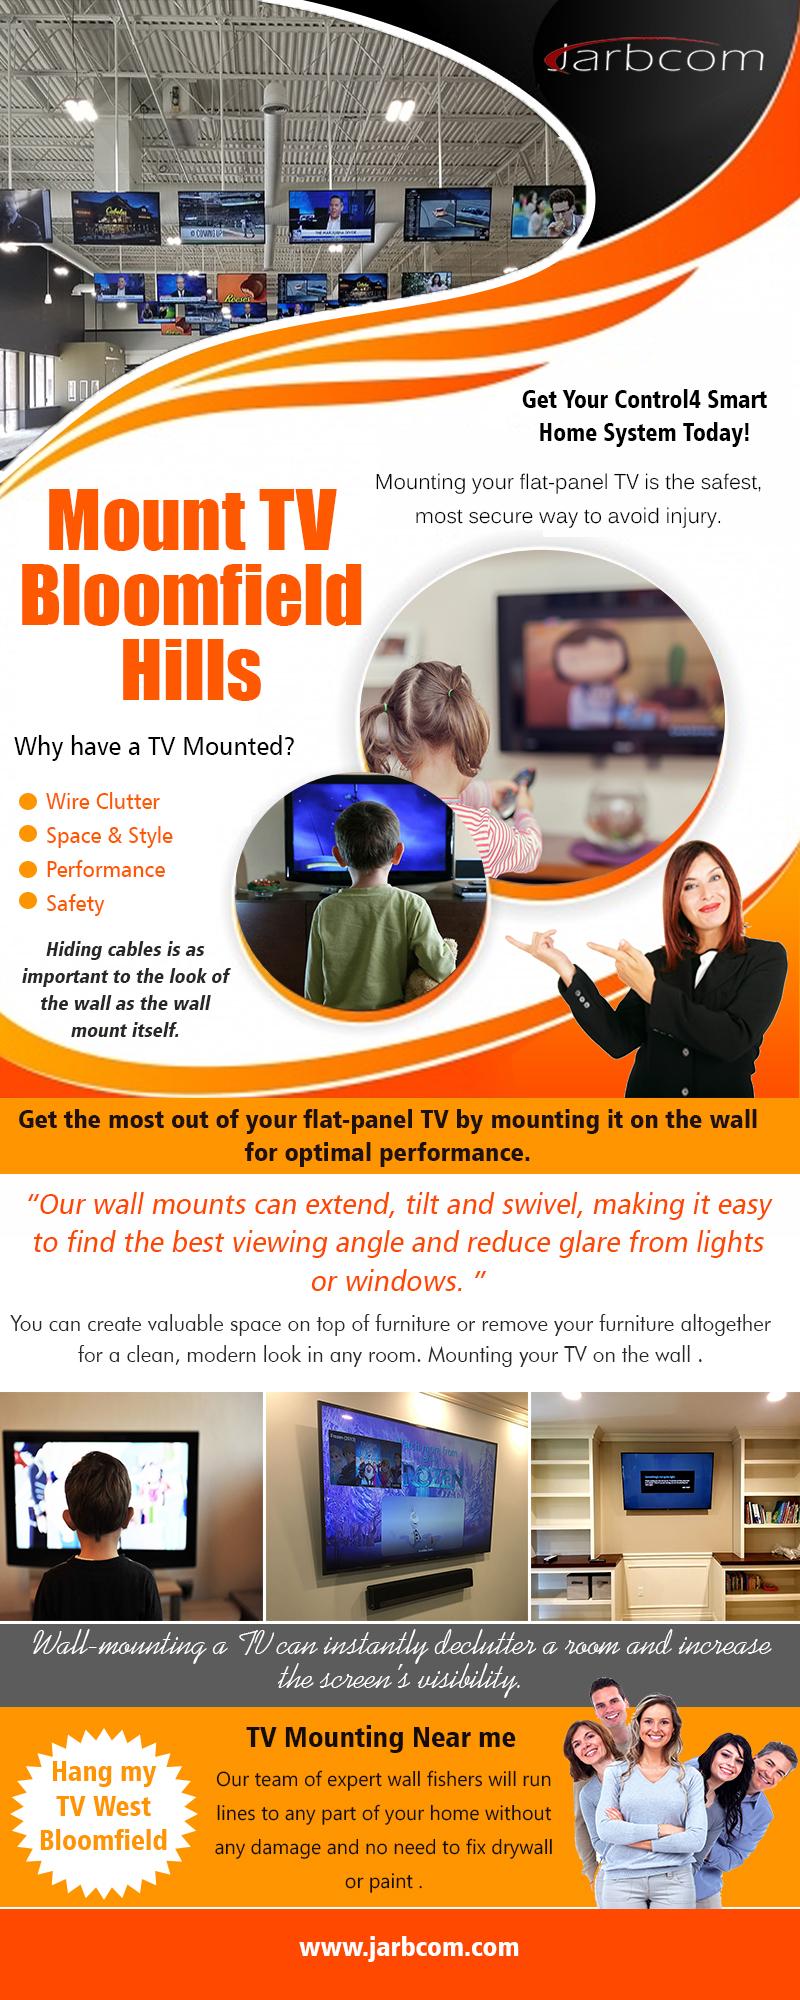 Mount TV Bloomfield Hills   Call – 1-800-369-0374   jarbcom.com